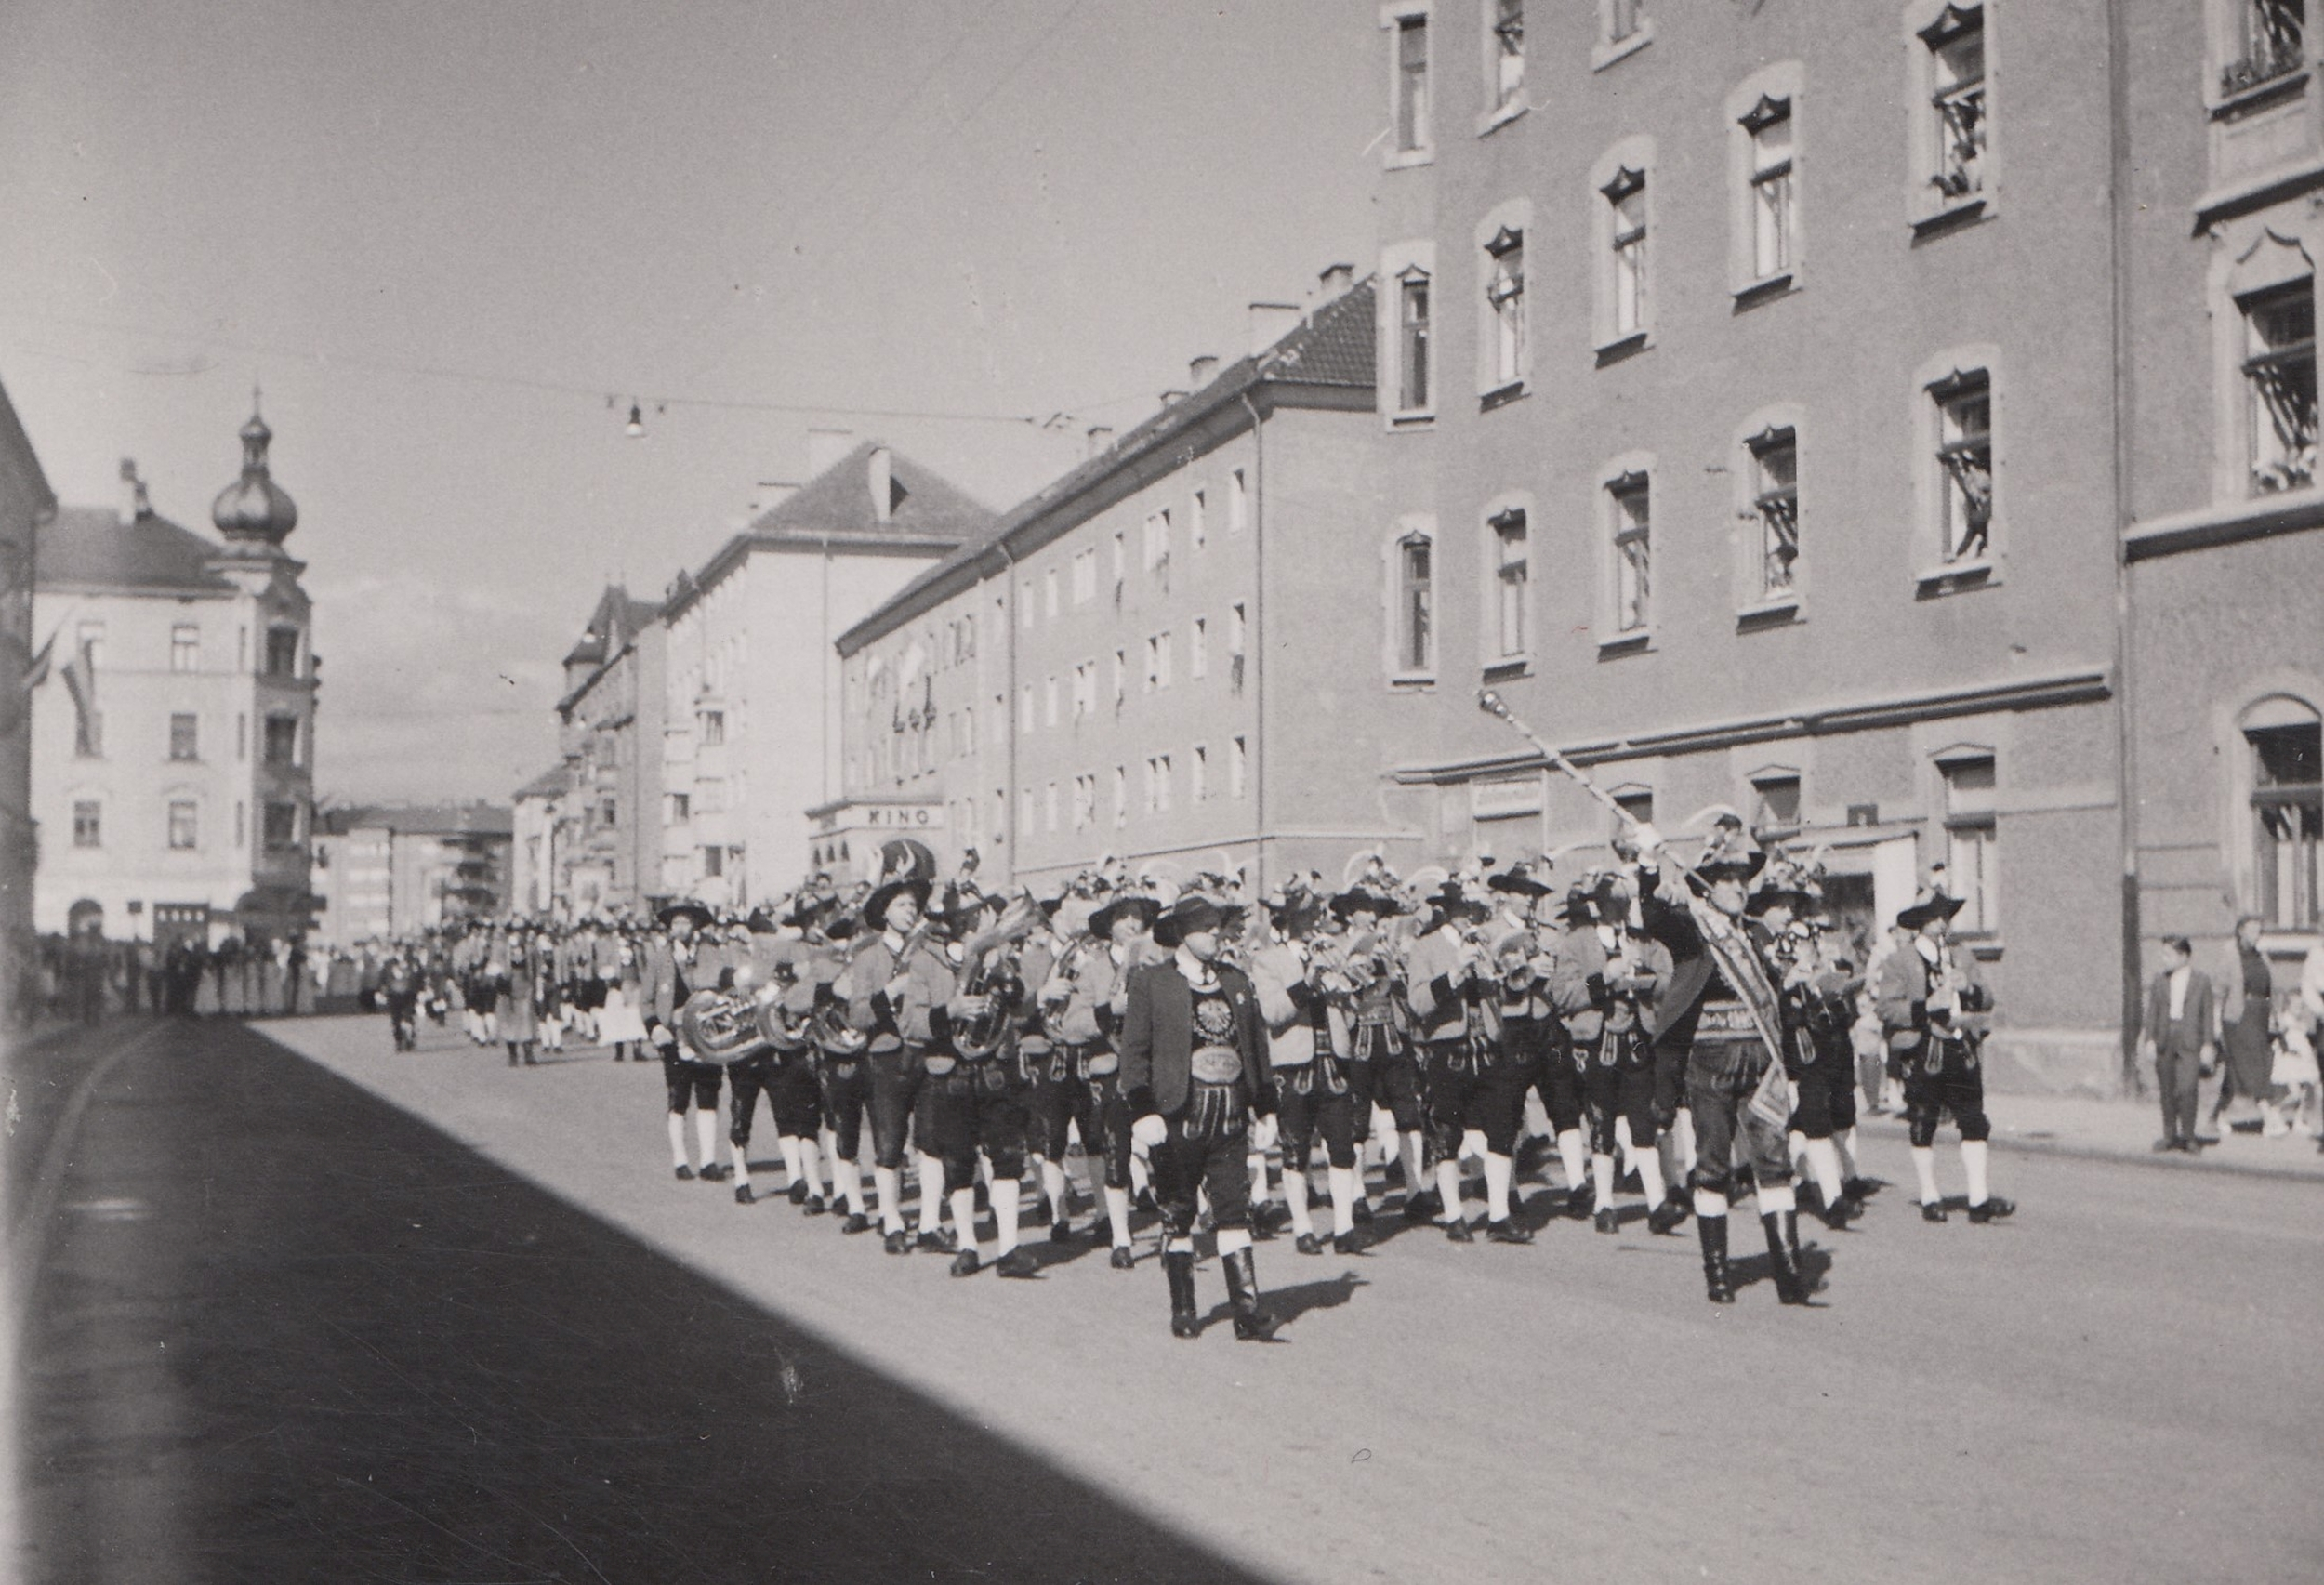 Aus Der Geschichte Der Stadtmusikkapelle Innsbruck-Pradl